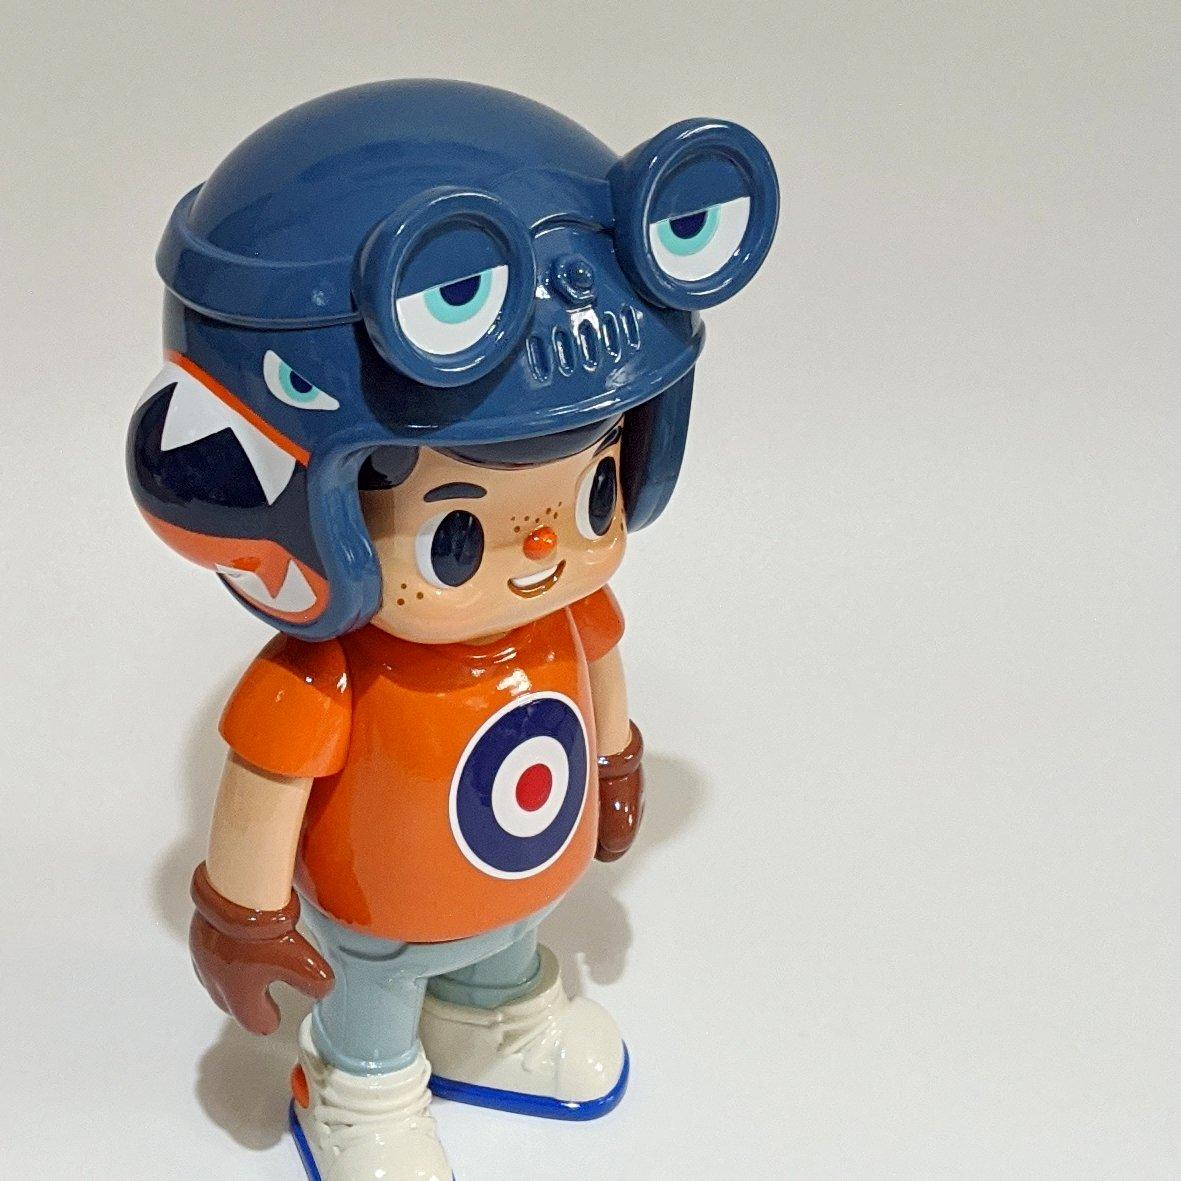 Image of owangeboy statue - fighterboyz